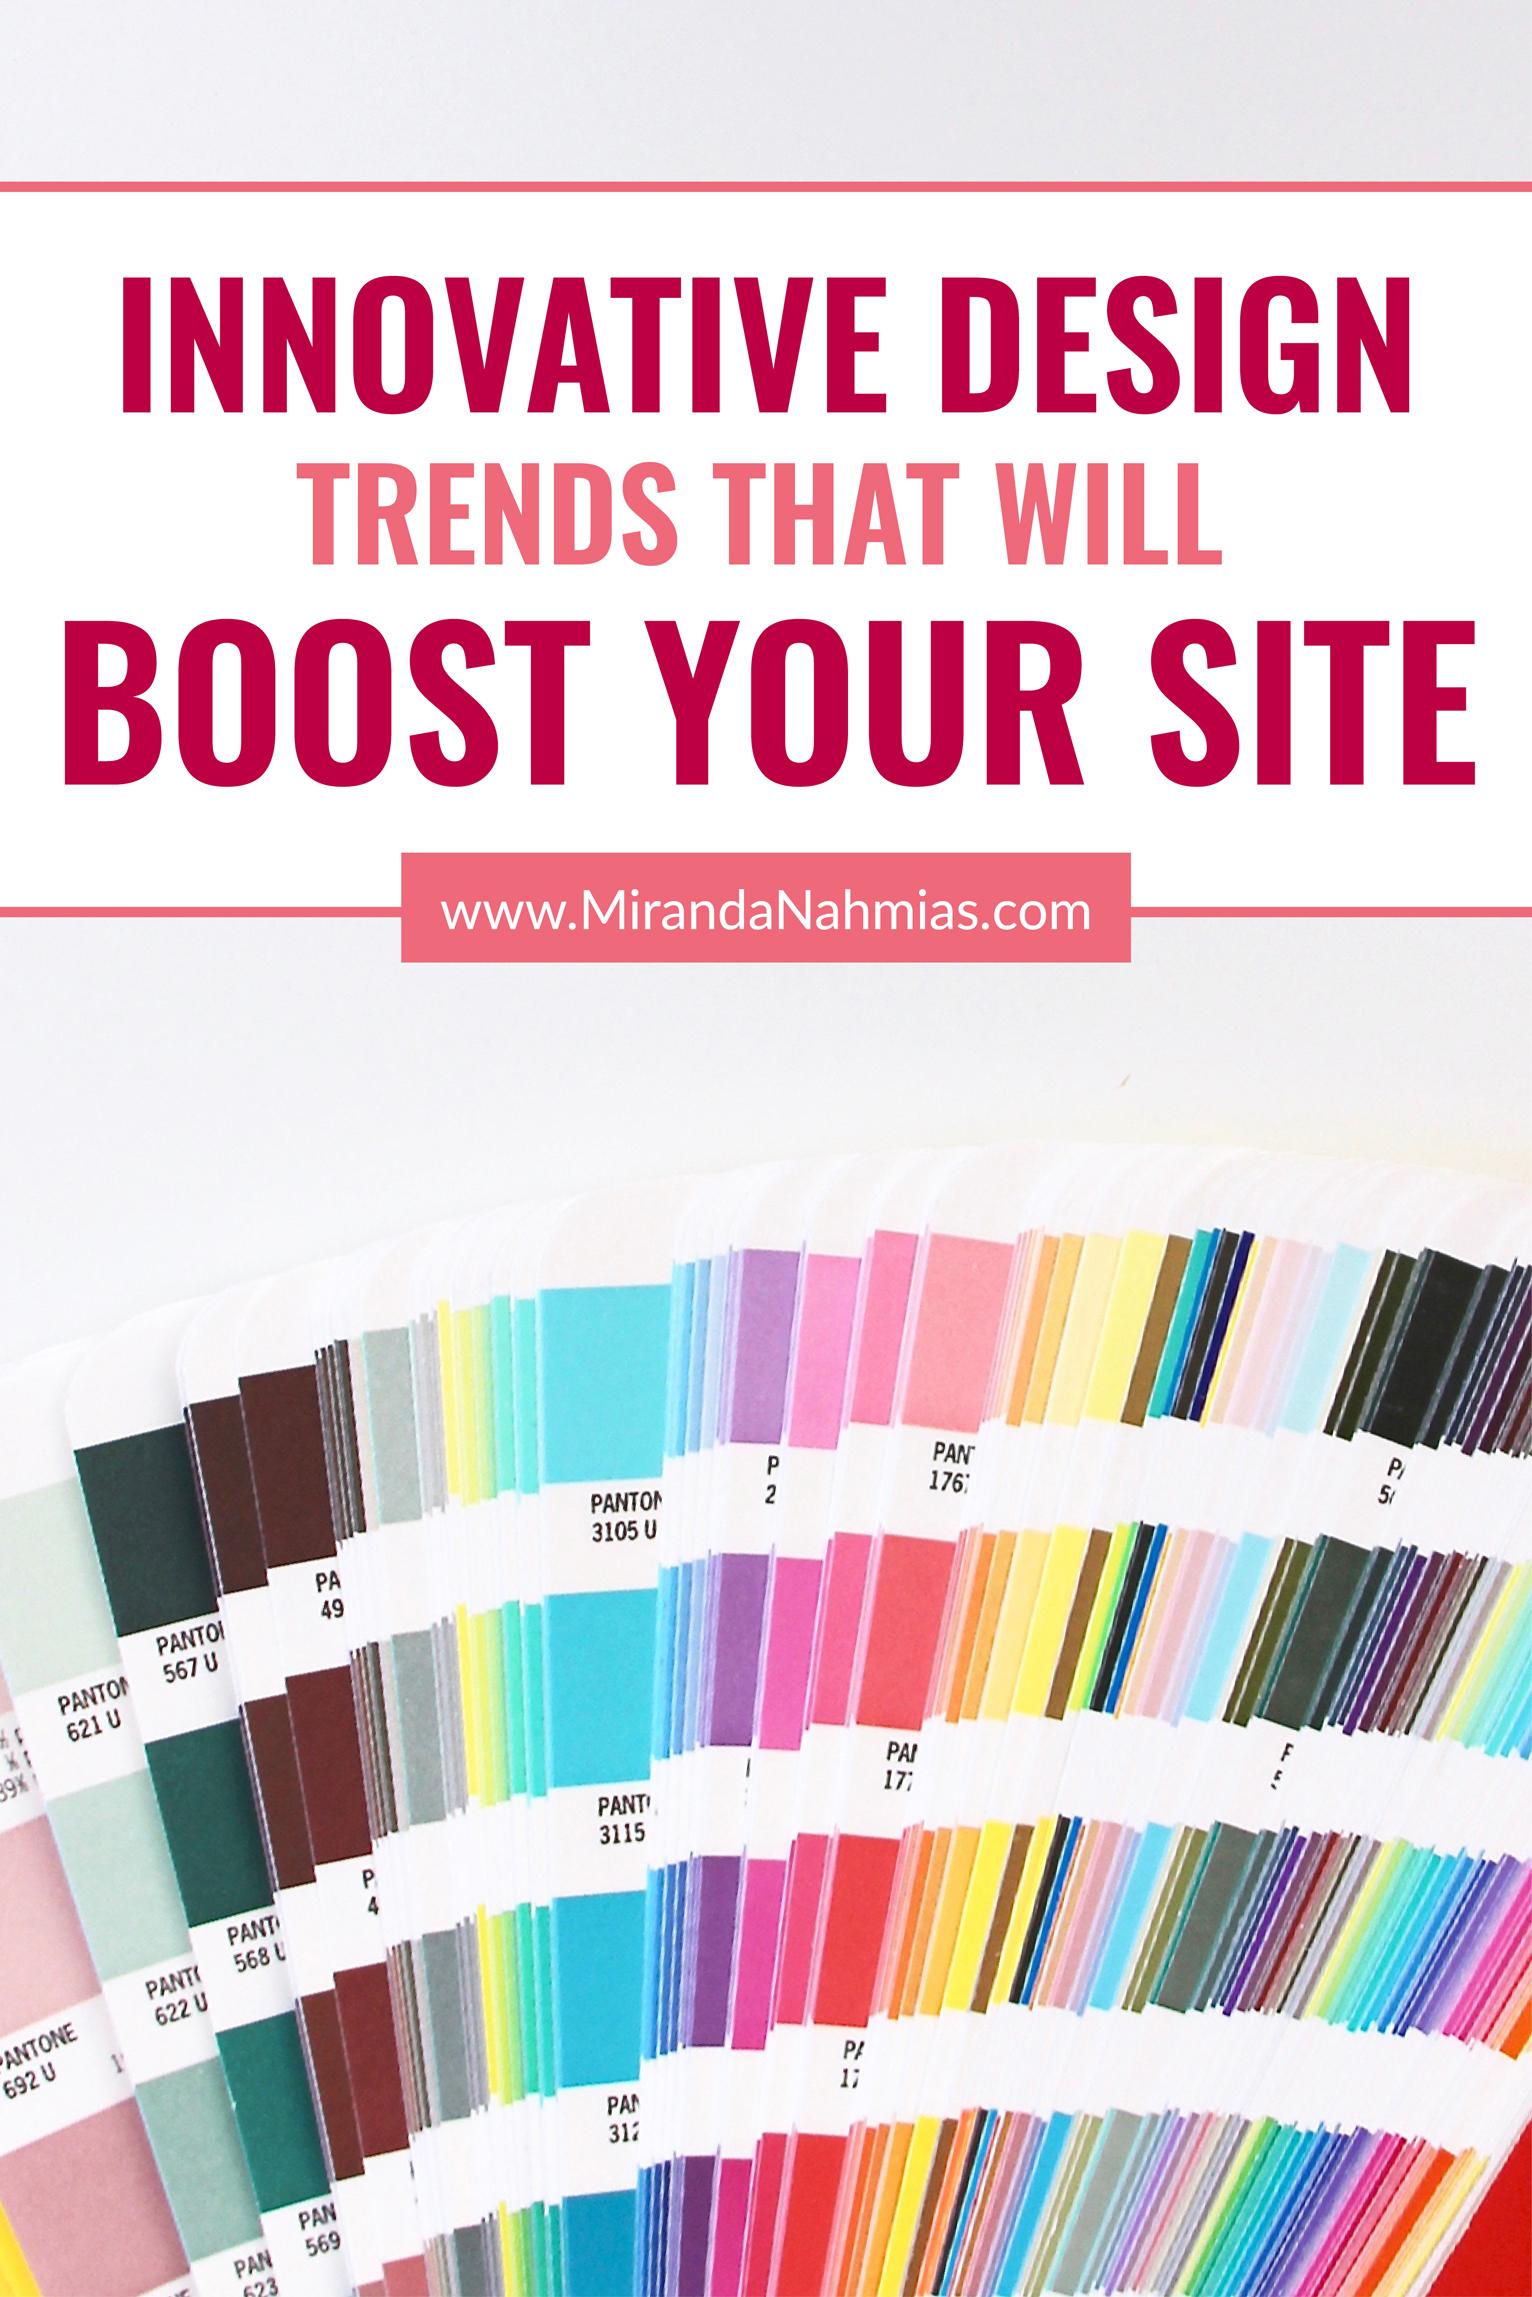 Innovative Design Trends That Will Boost Your Site! via www.mirandanahmias.com